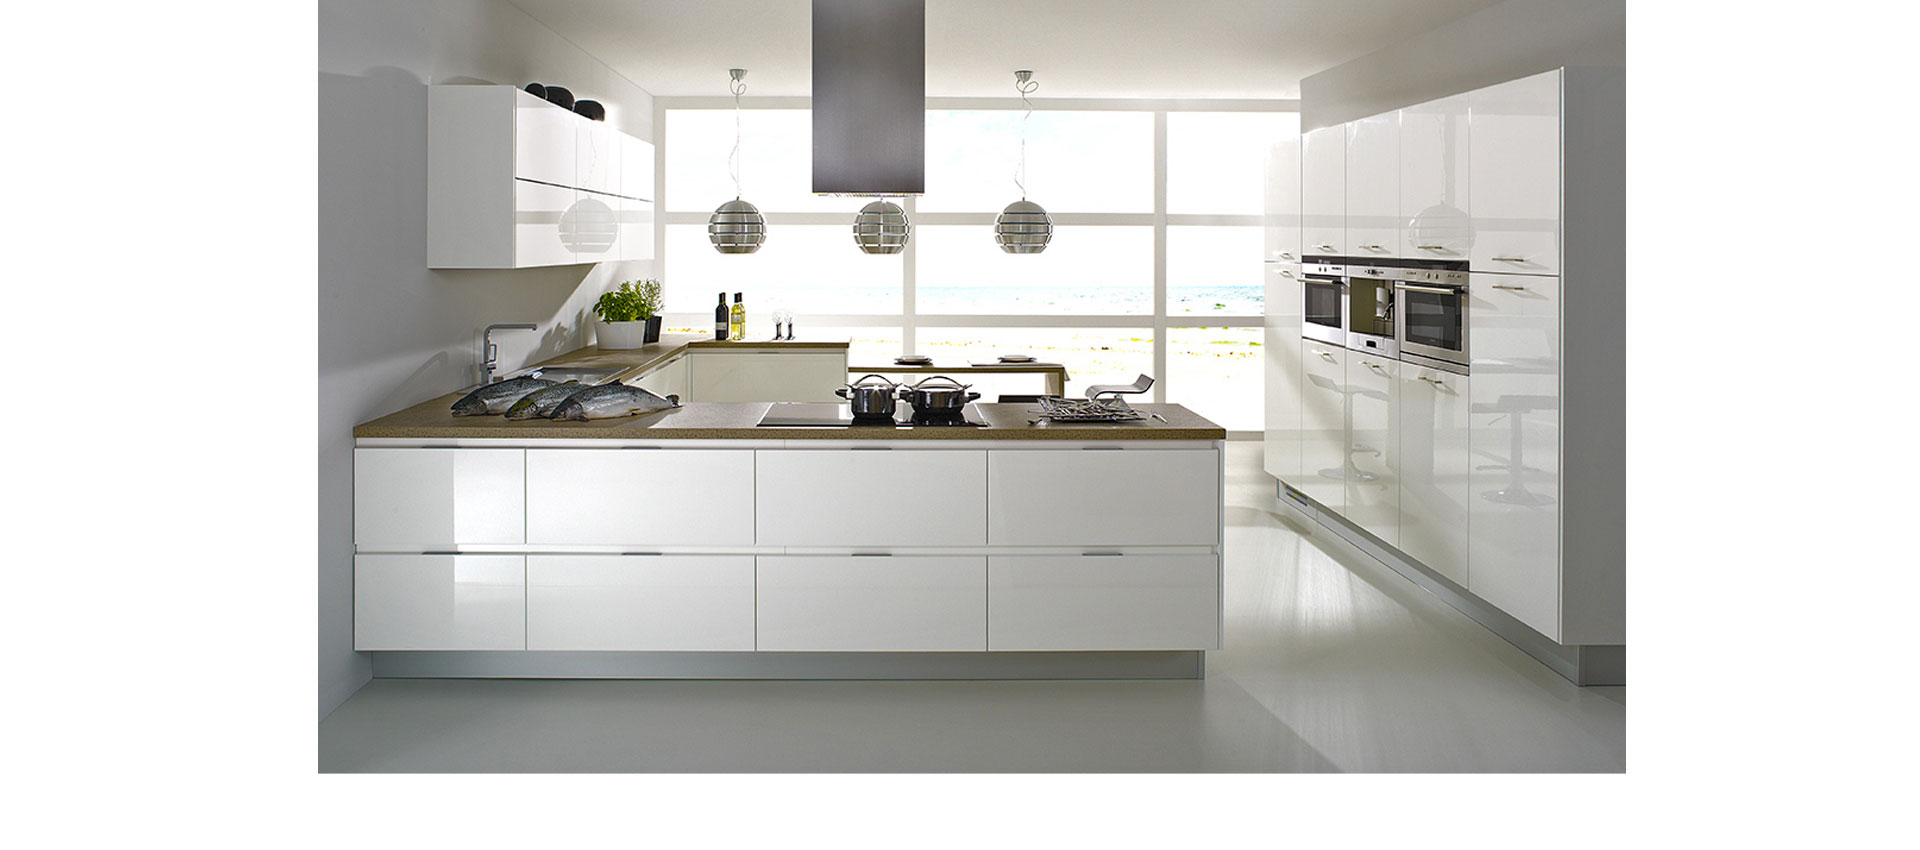 Home Atlas Kitchens